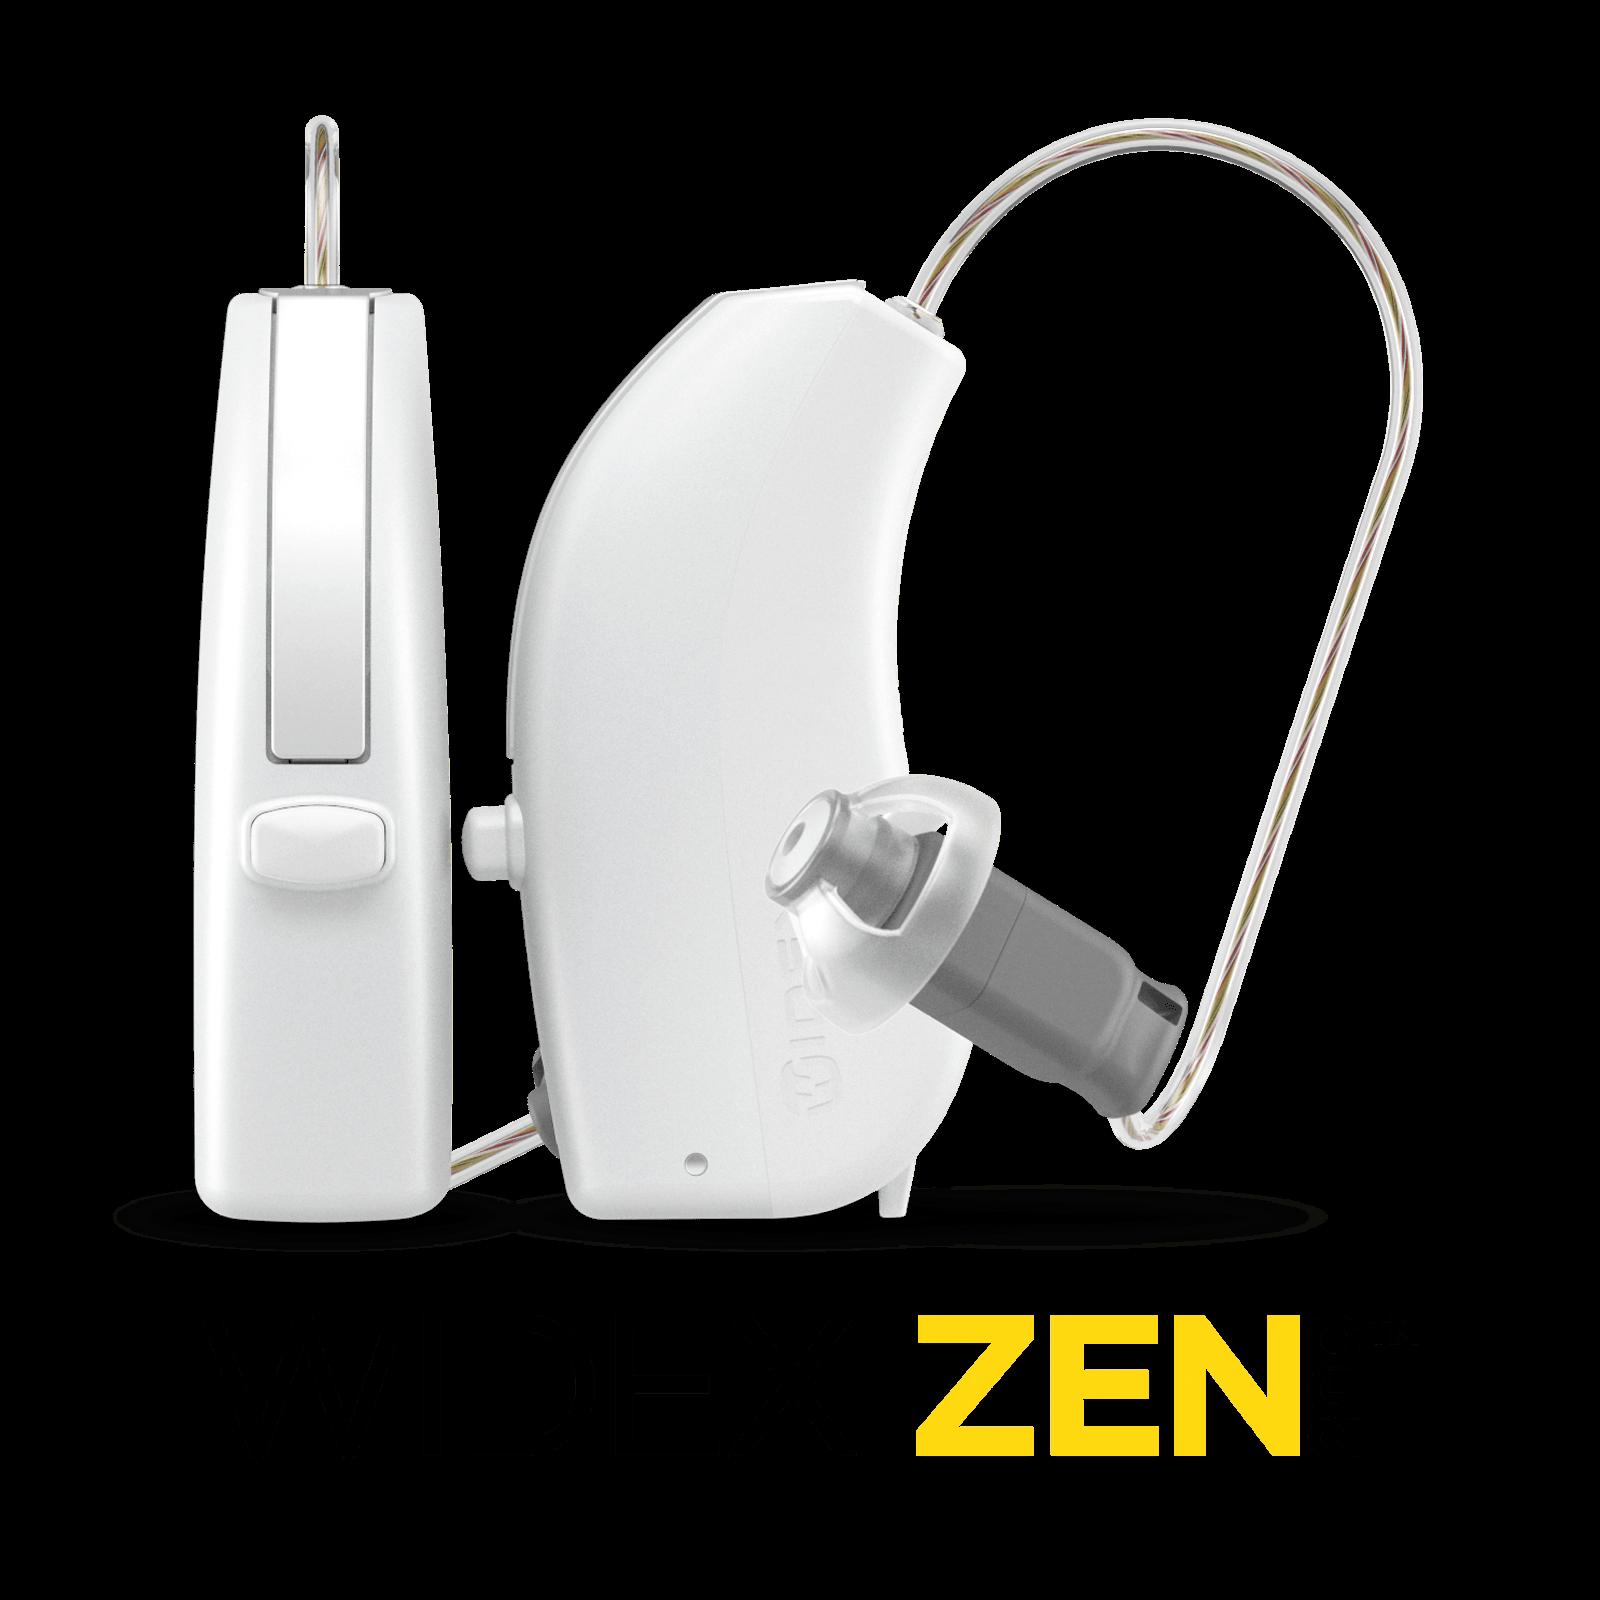 Widex Zen for tinnitus treatment